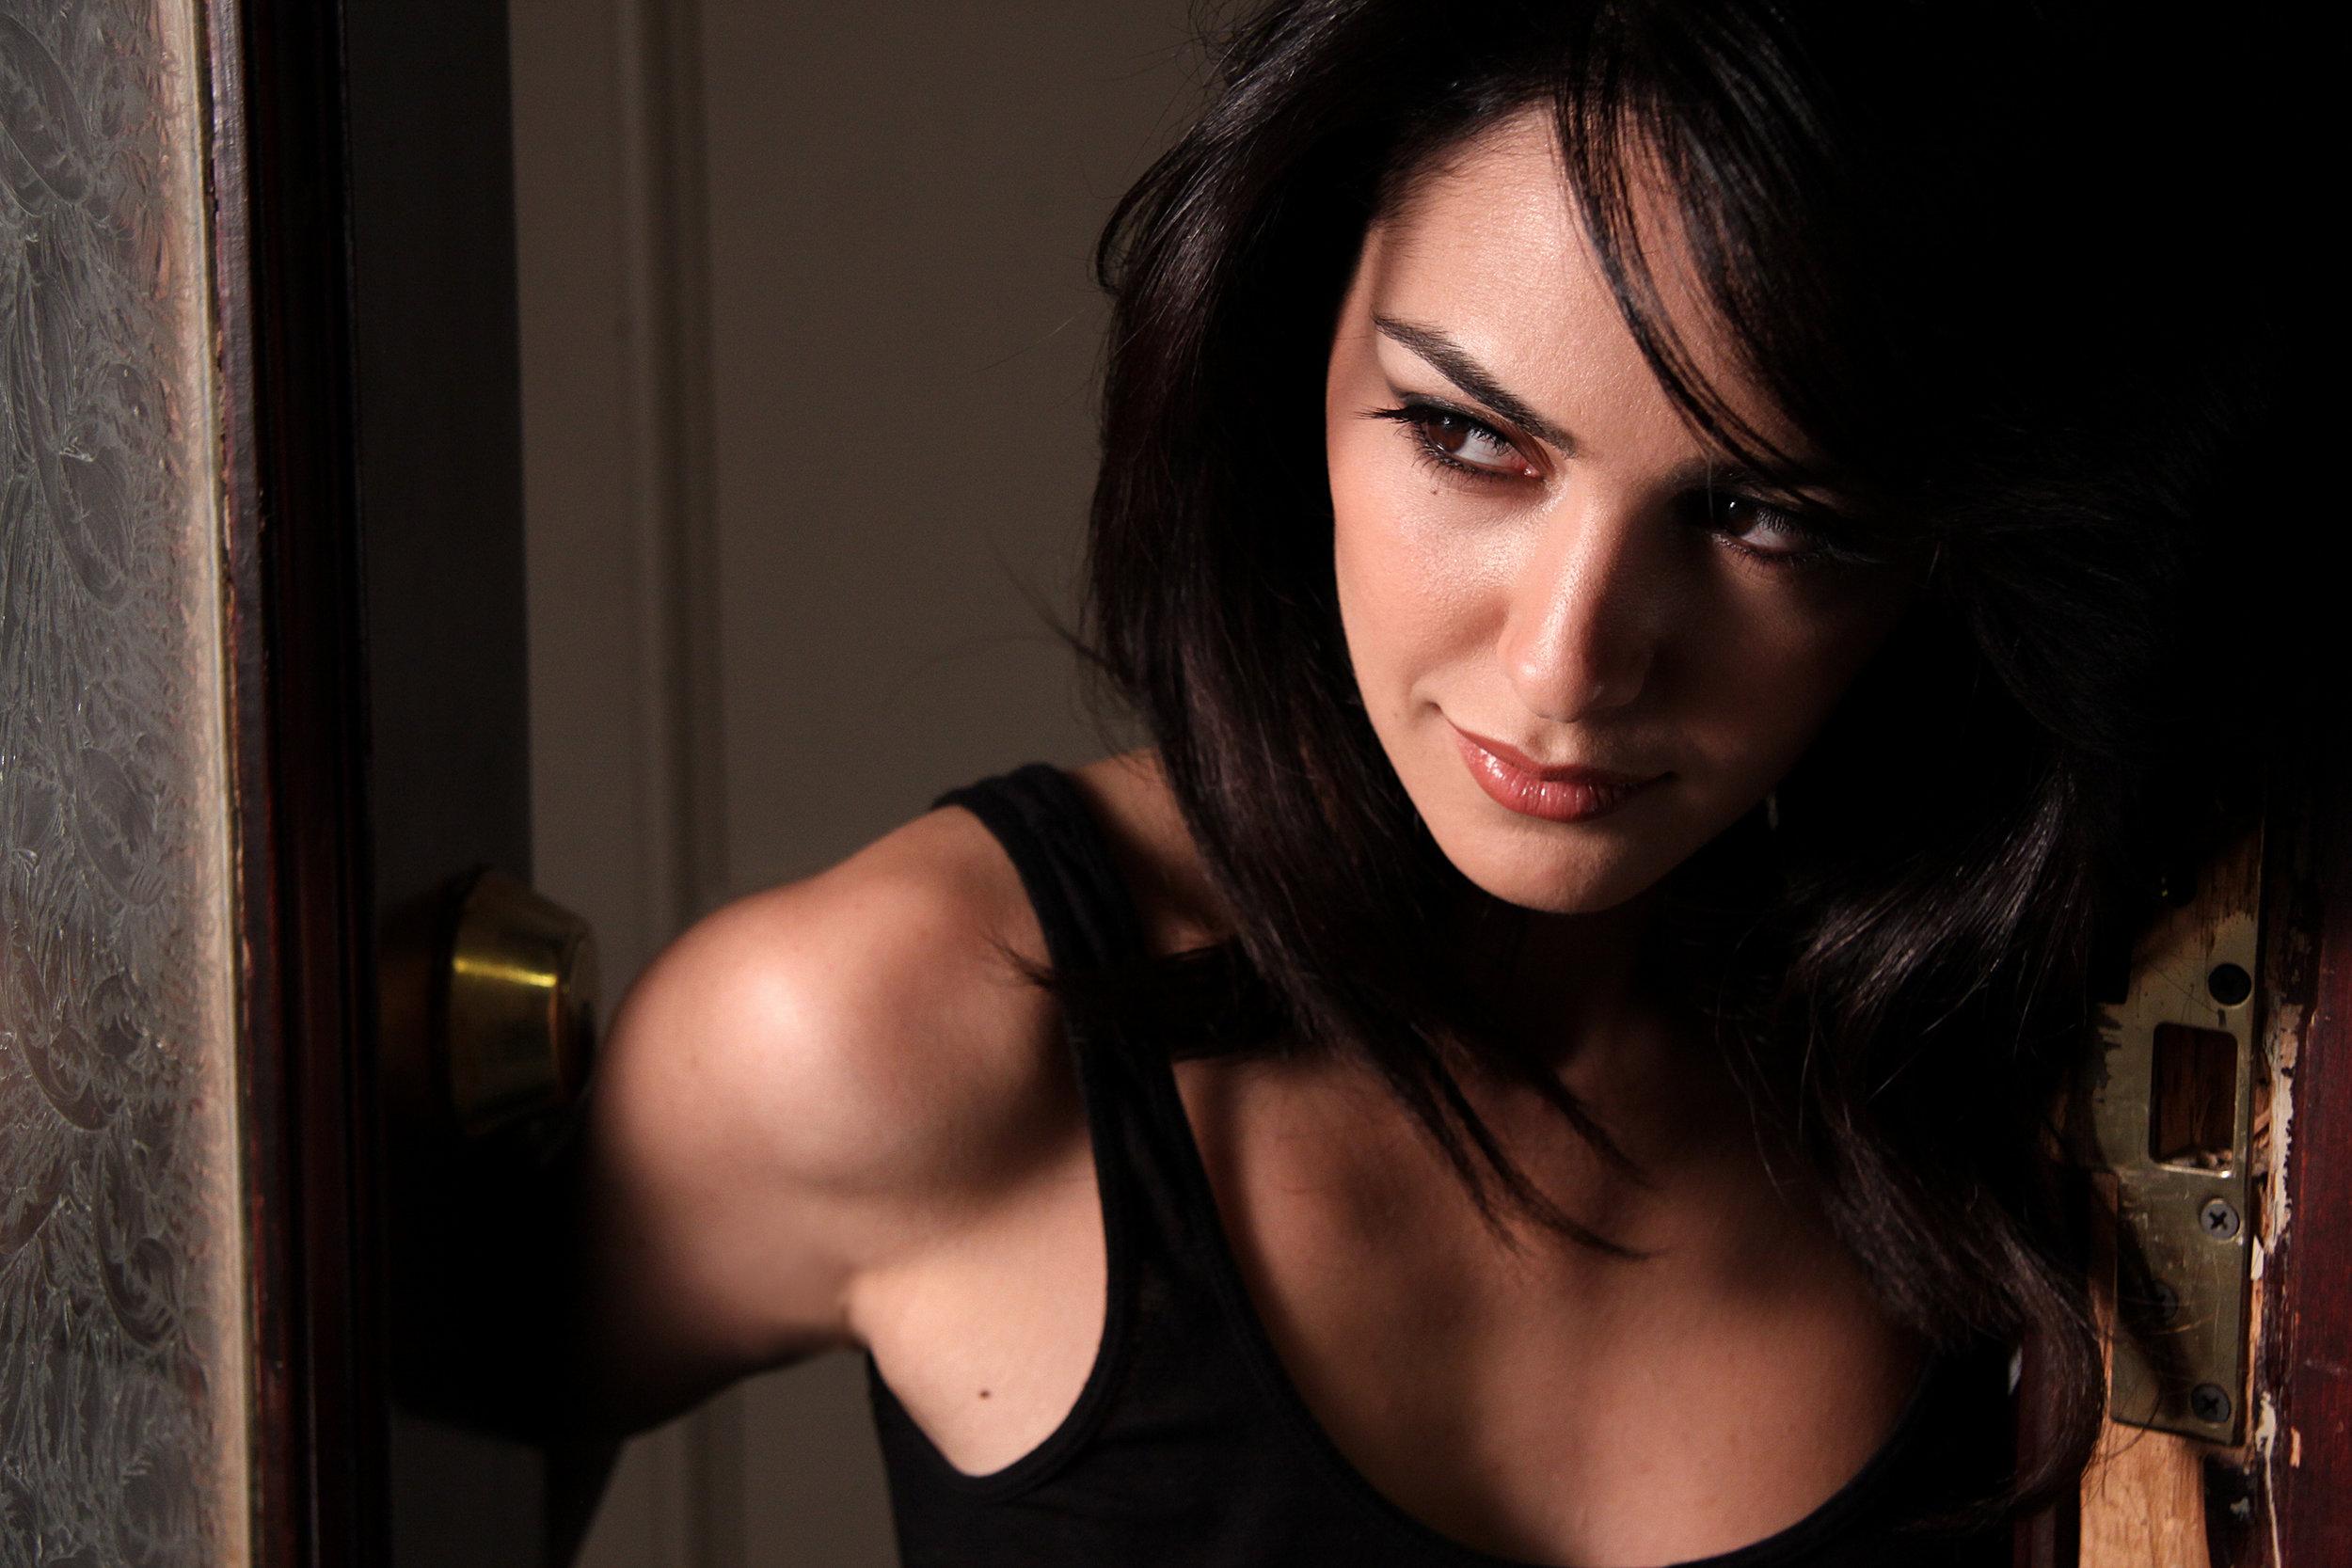 Nazanin Boniadi - Actress Homeland, Hotel Mumbai